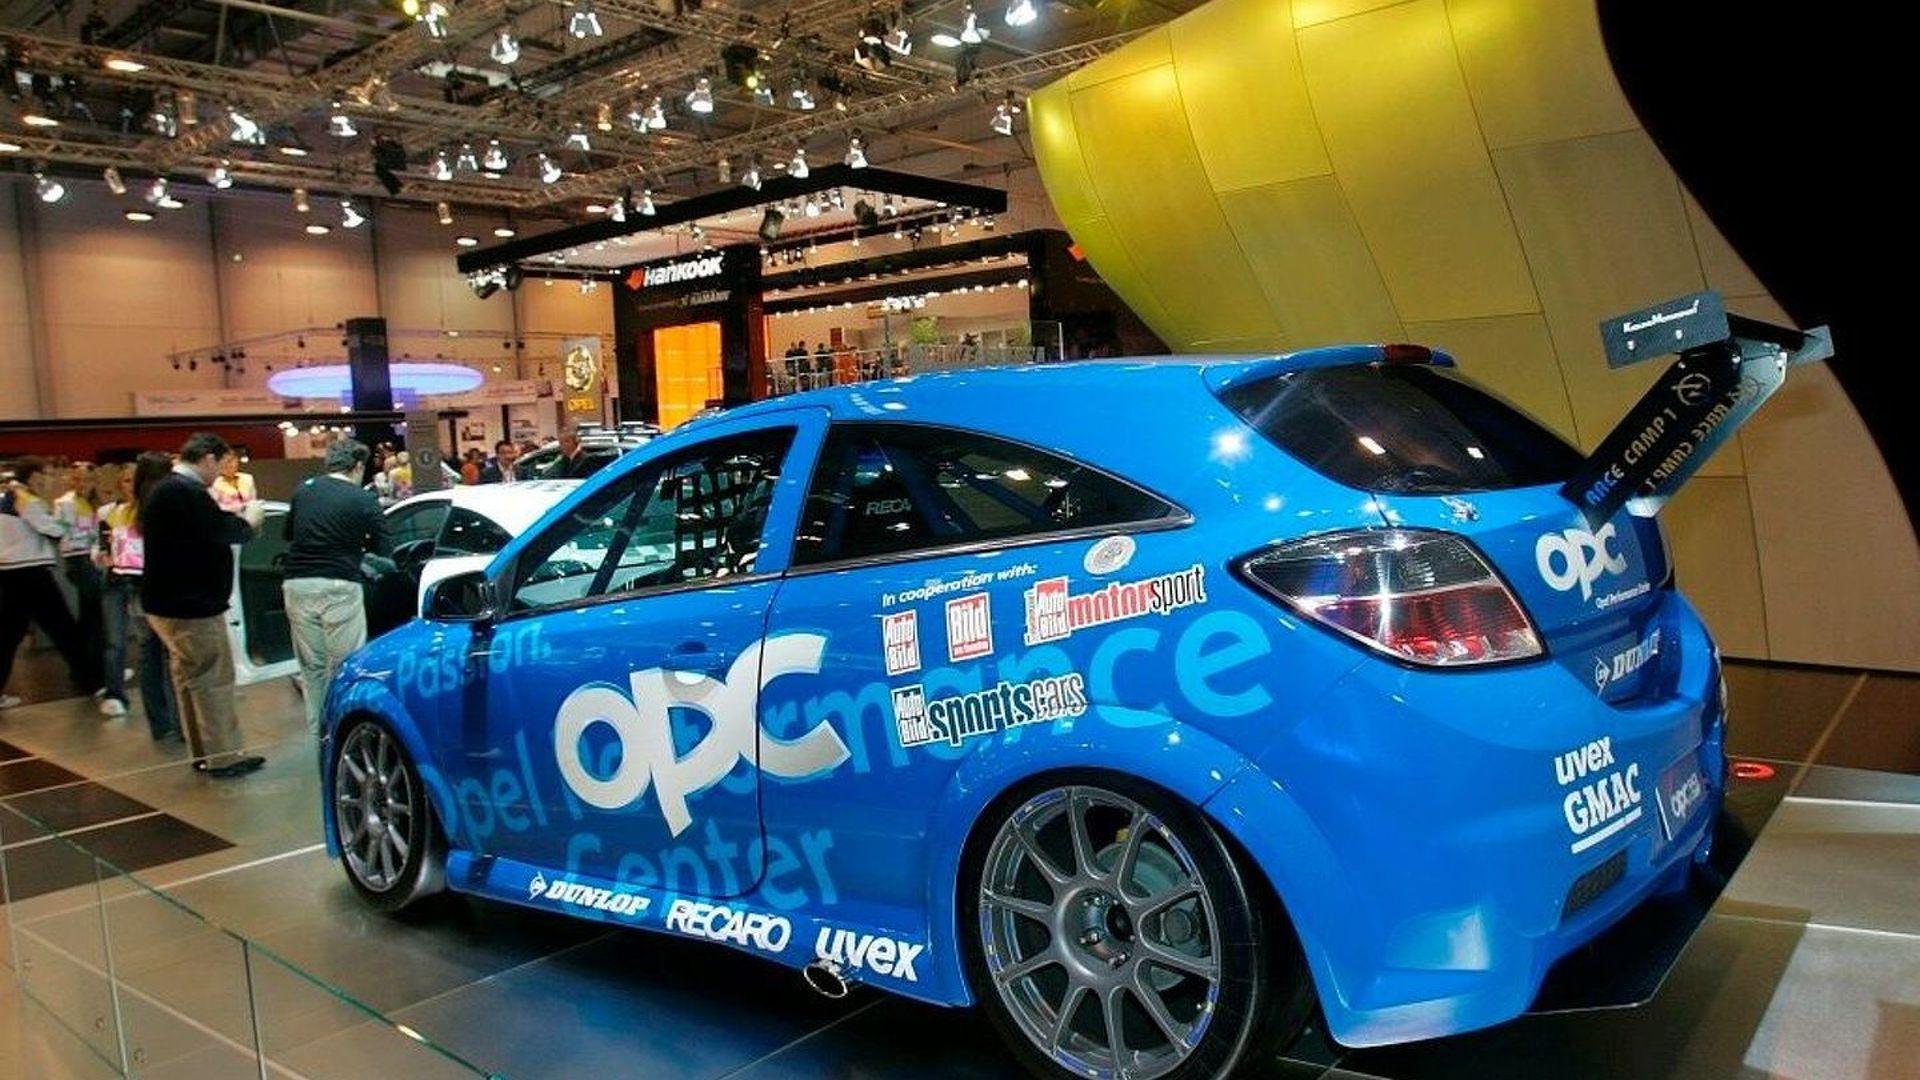 Opel Presents Racing Version Astra OPC Race Camp at Essen